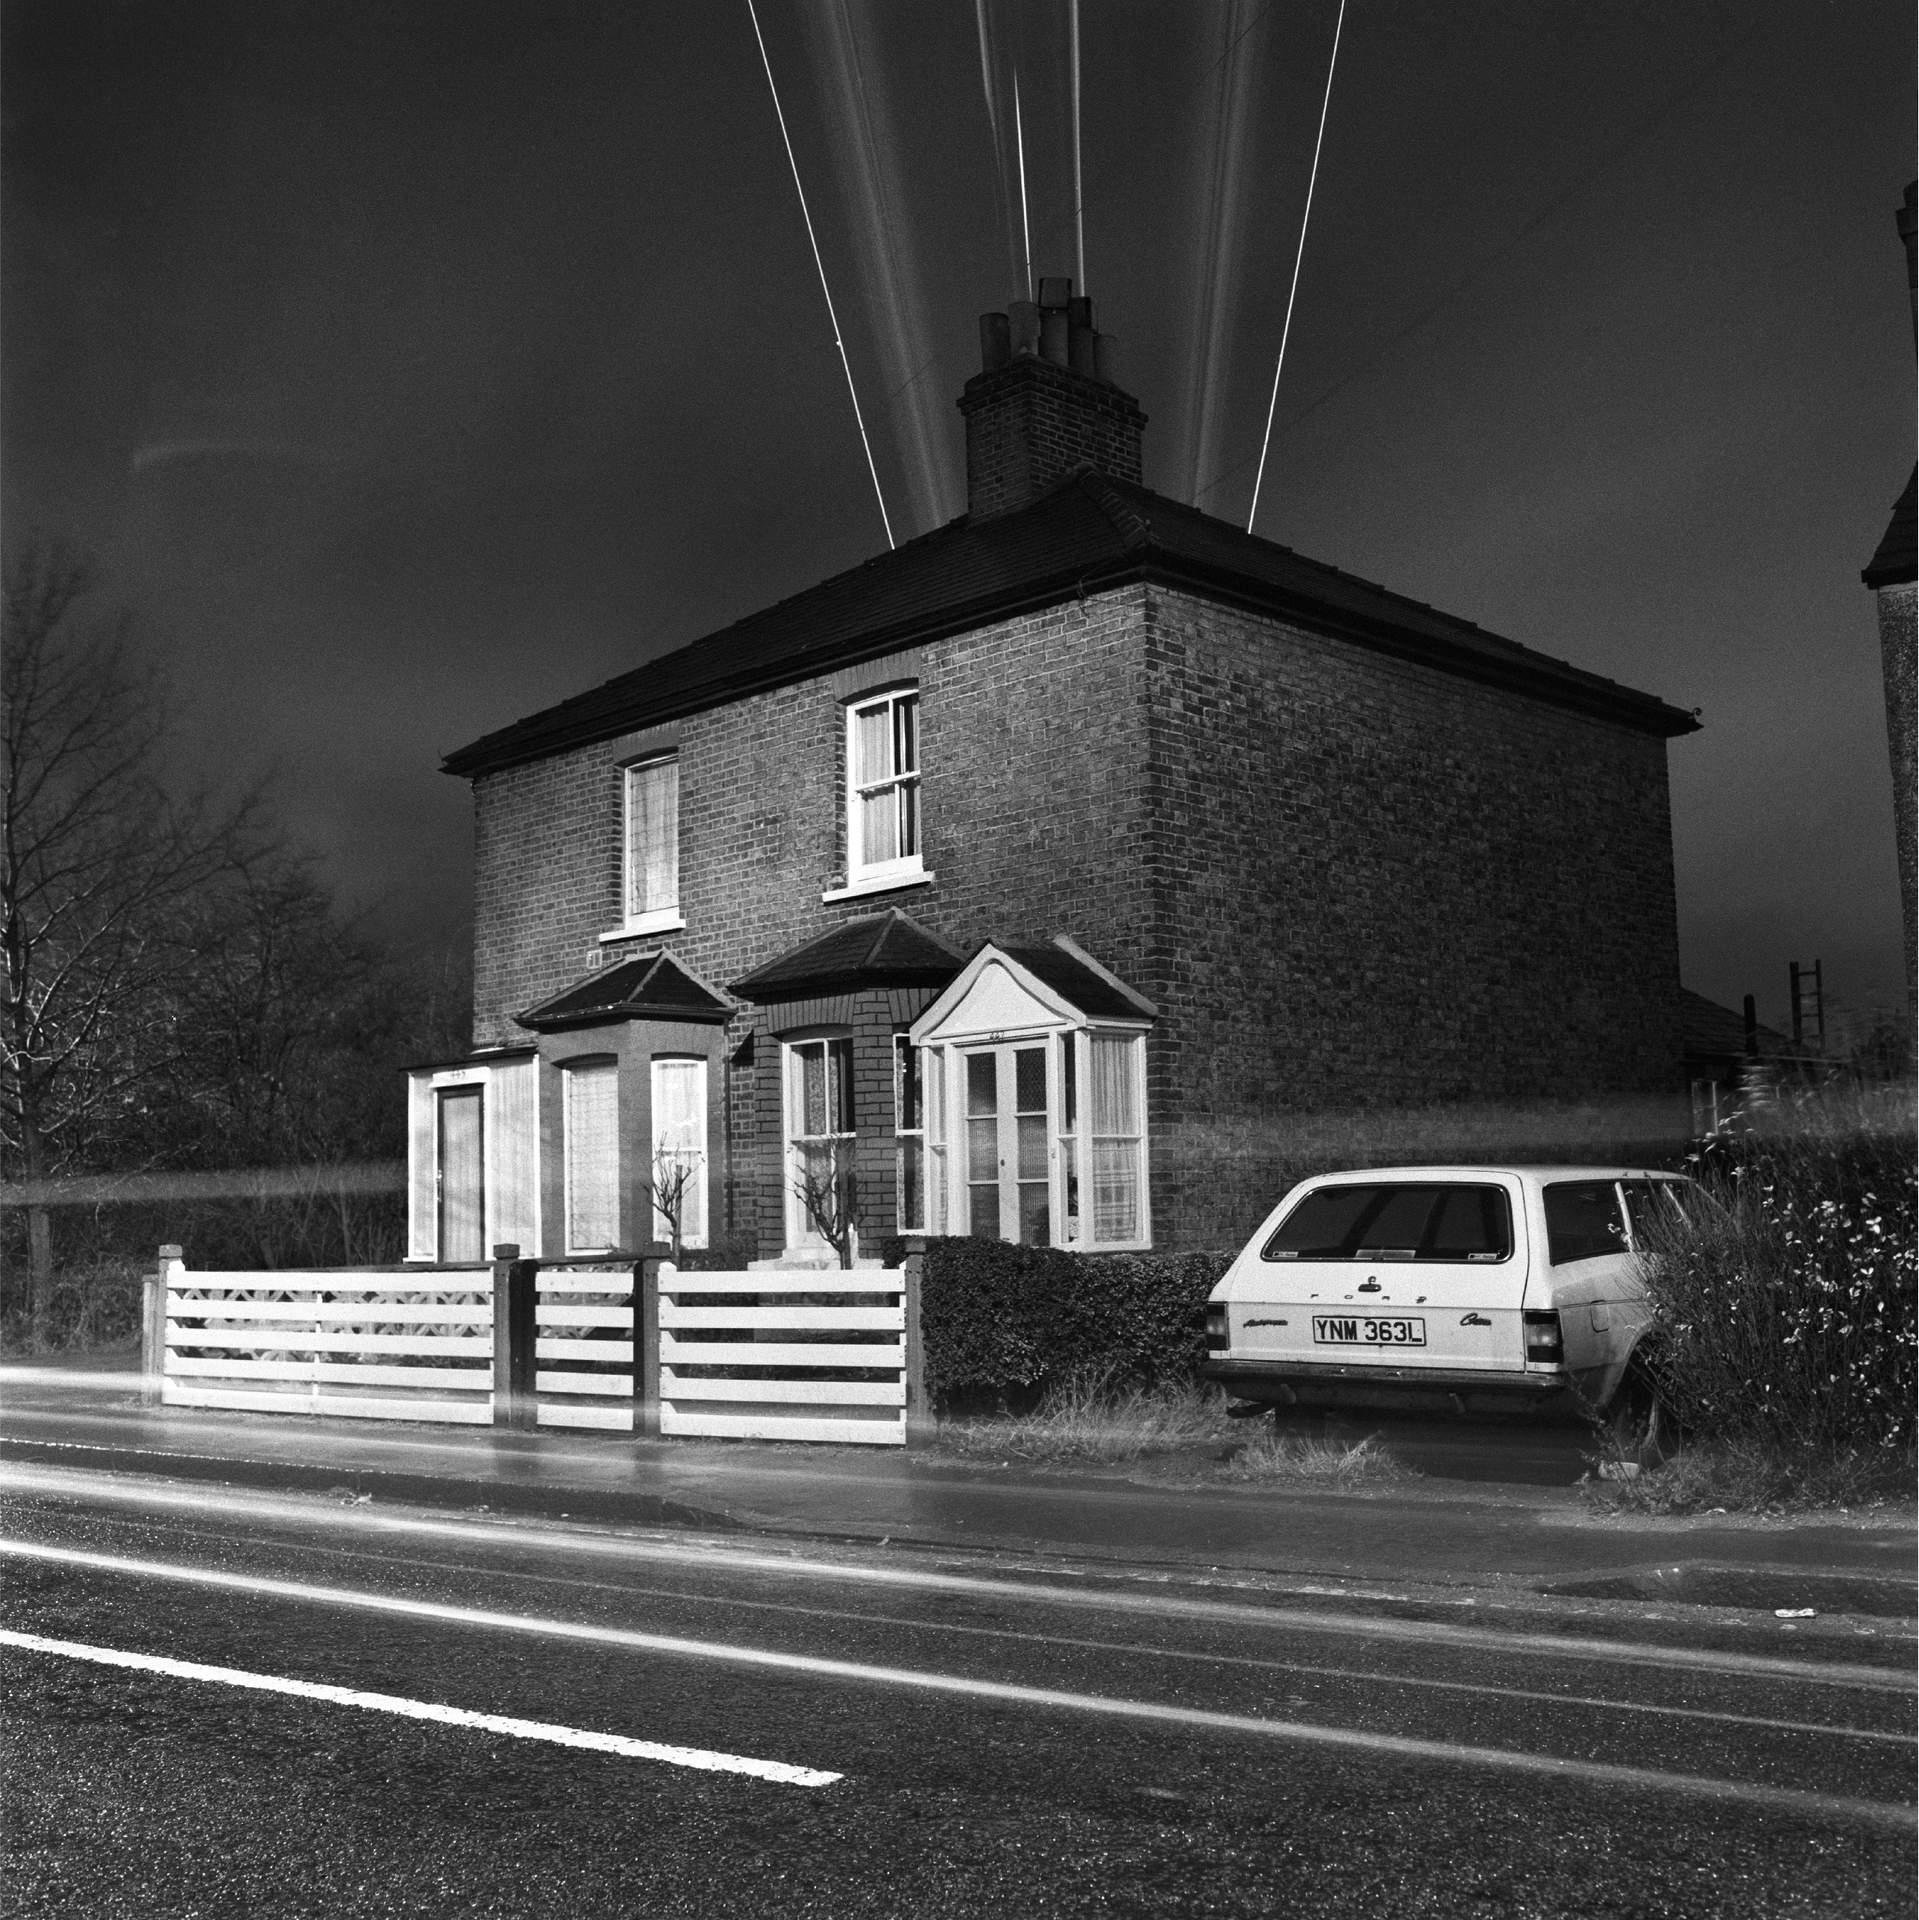 London by Night, 1983